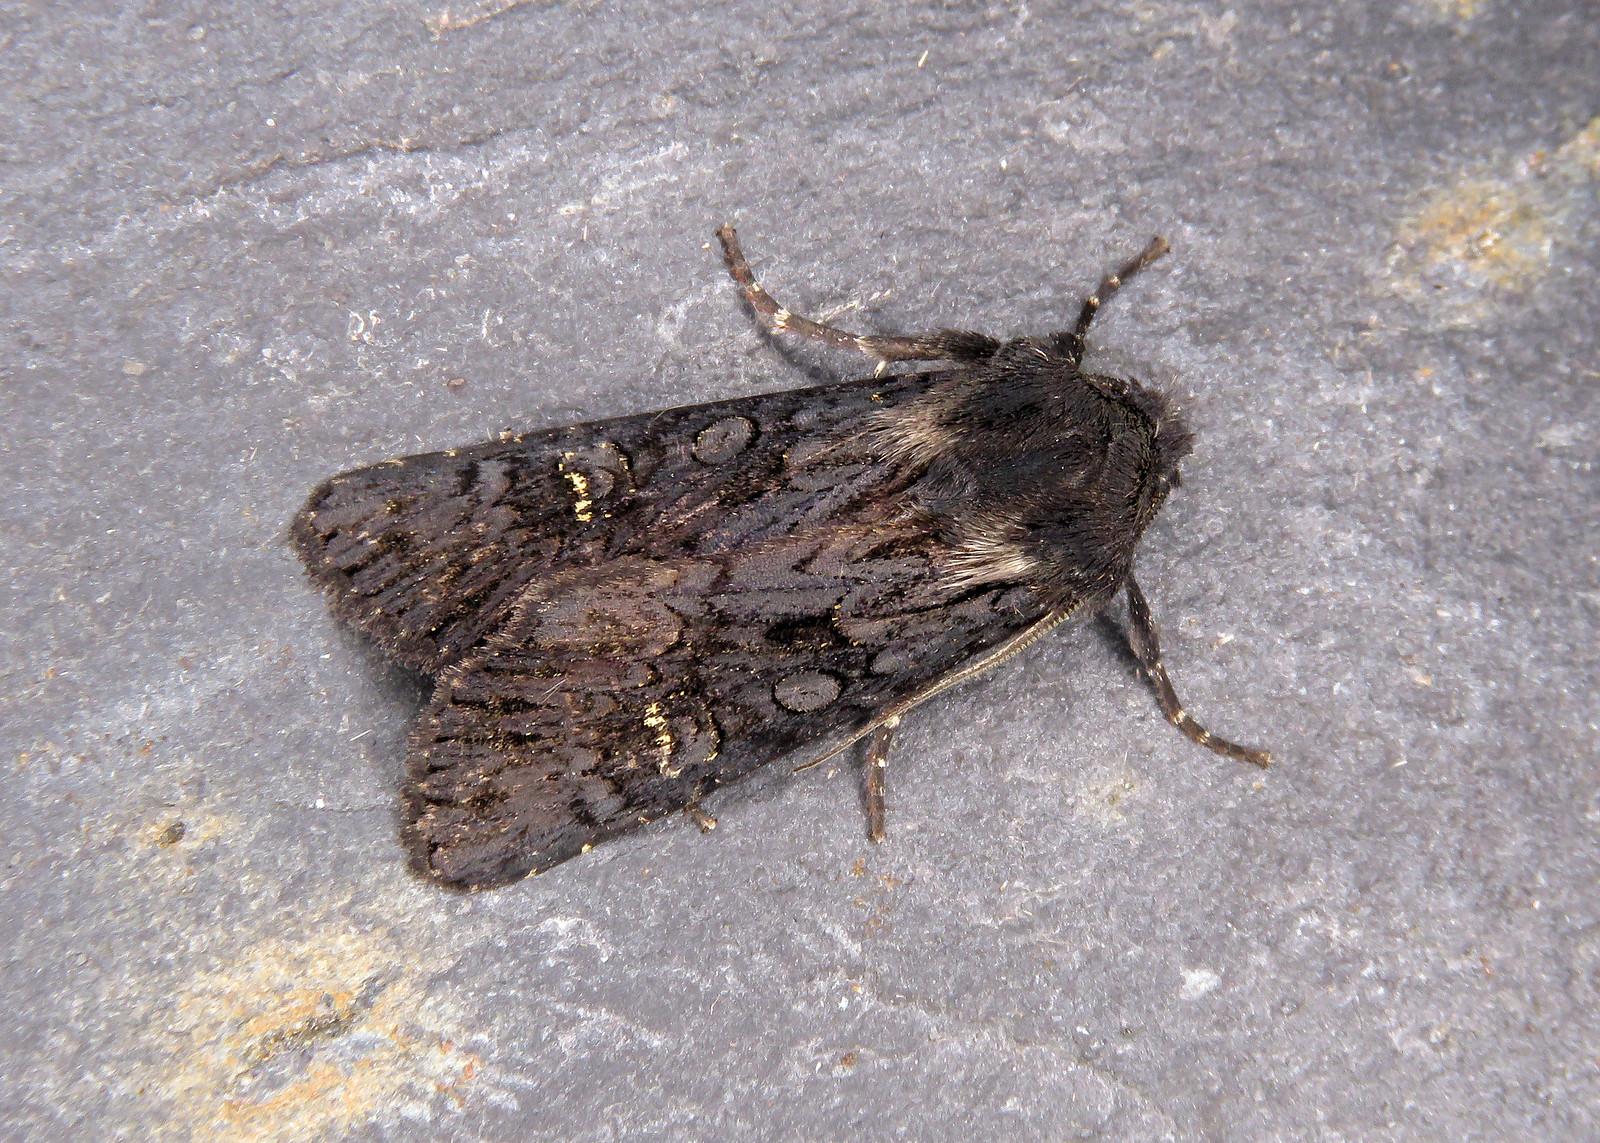 73.233 Black Rustic - Aporophyla nigra